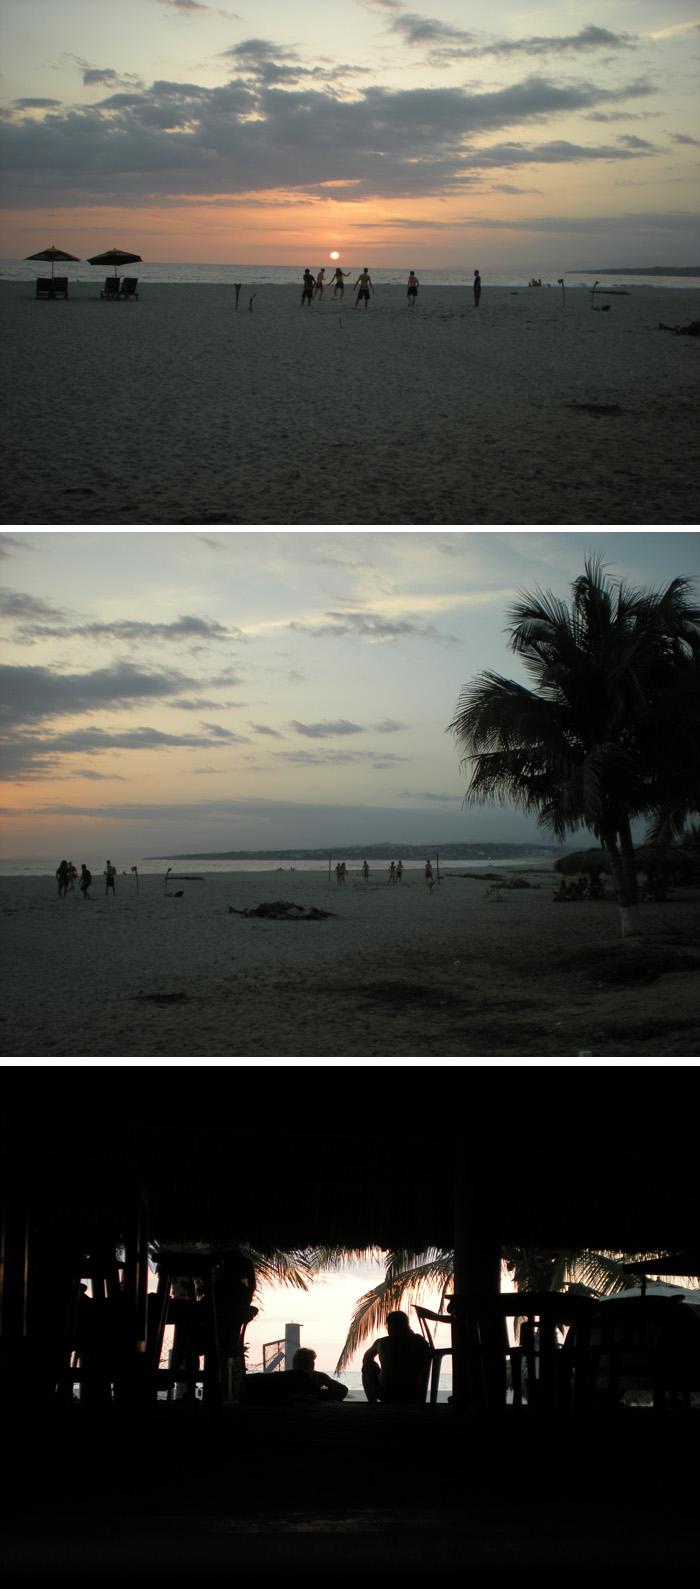 Playa Zicaltela, Mexico